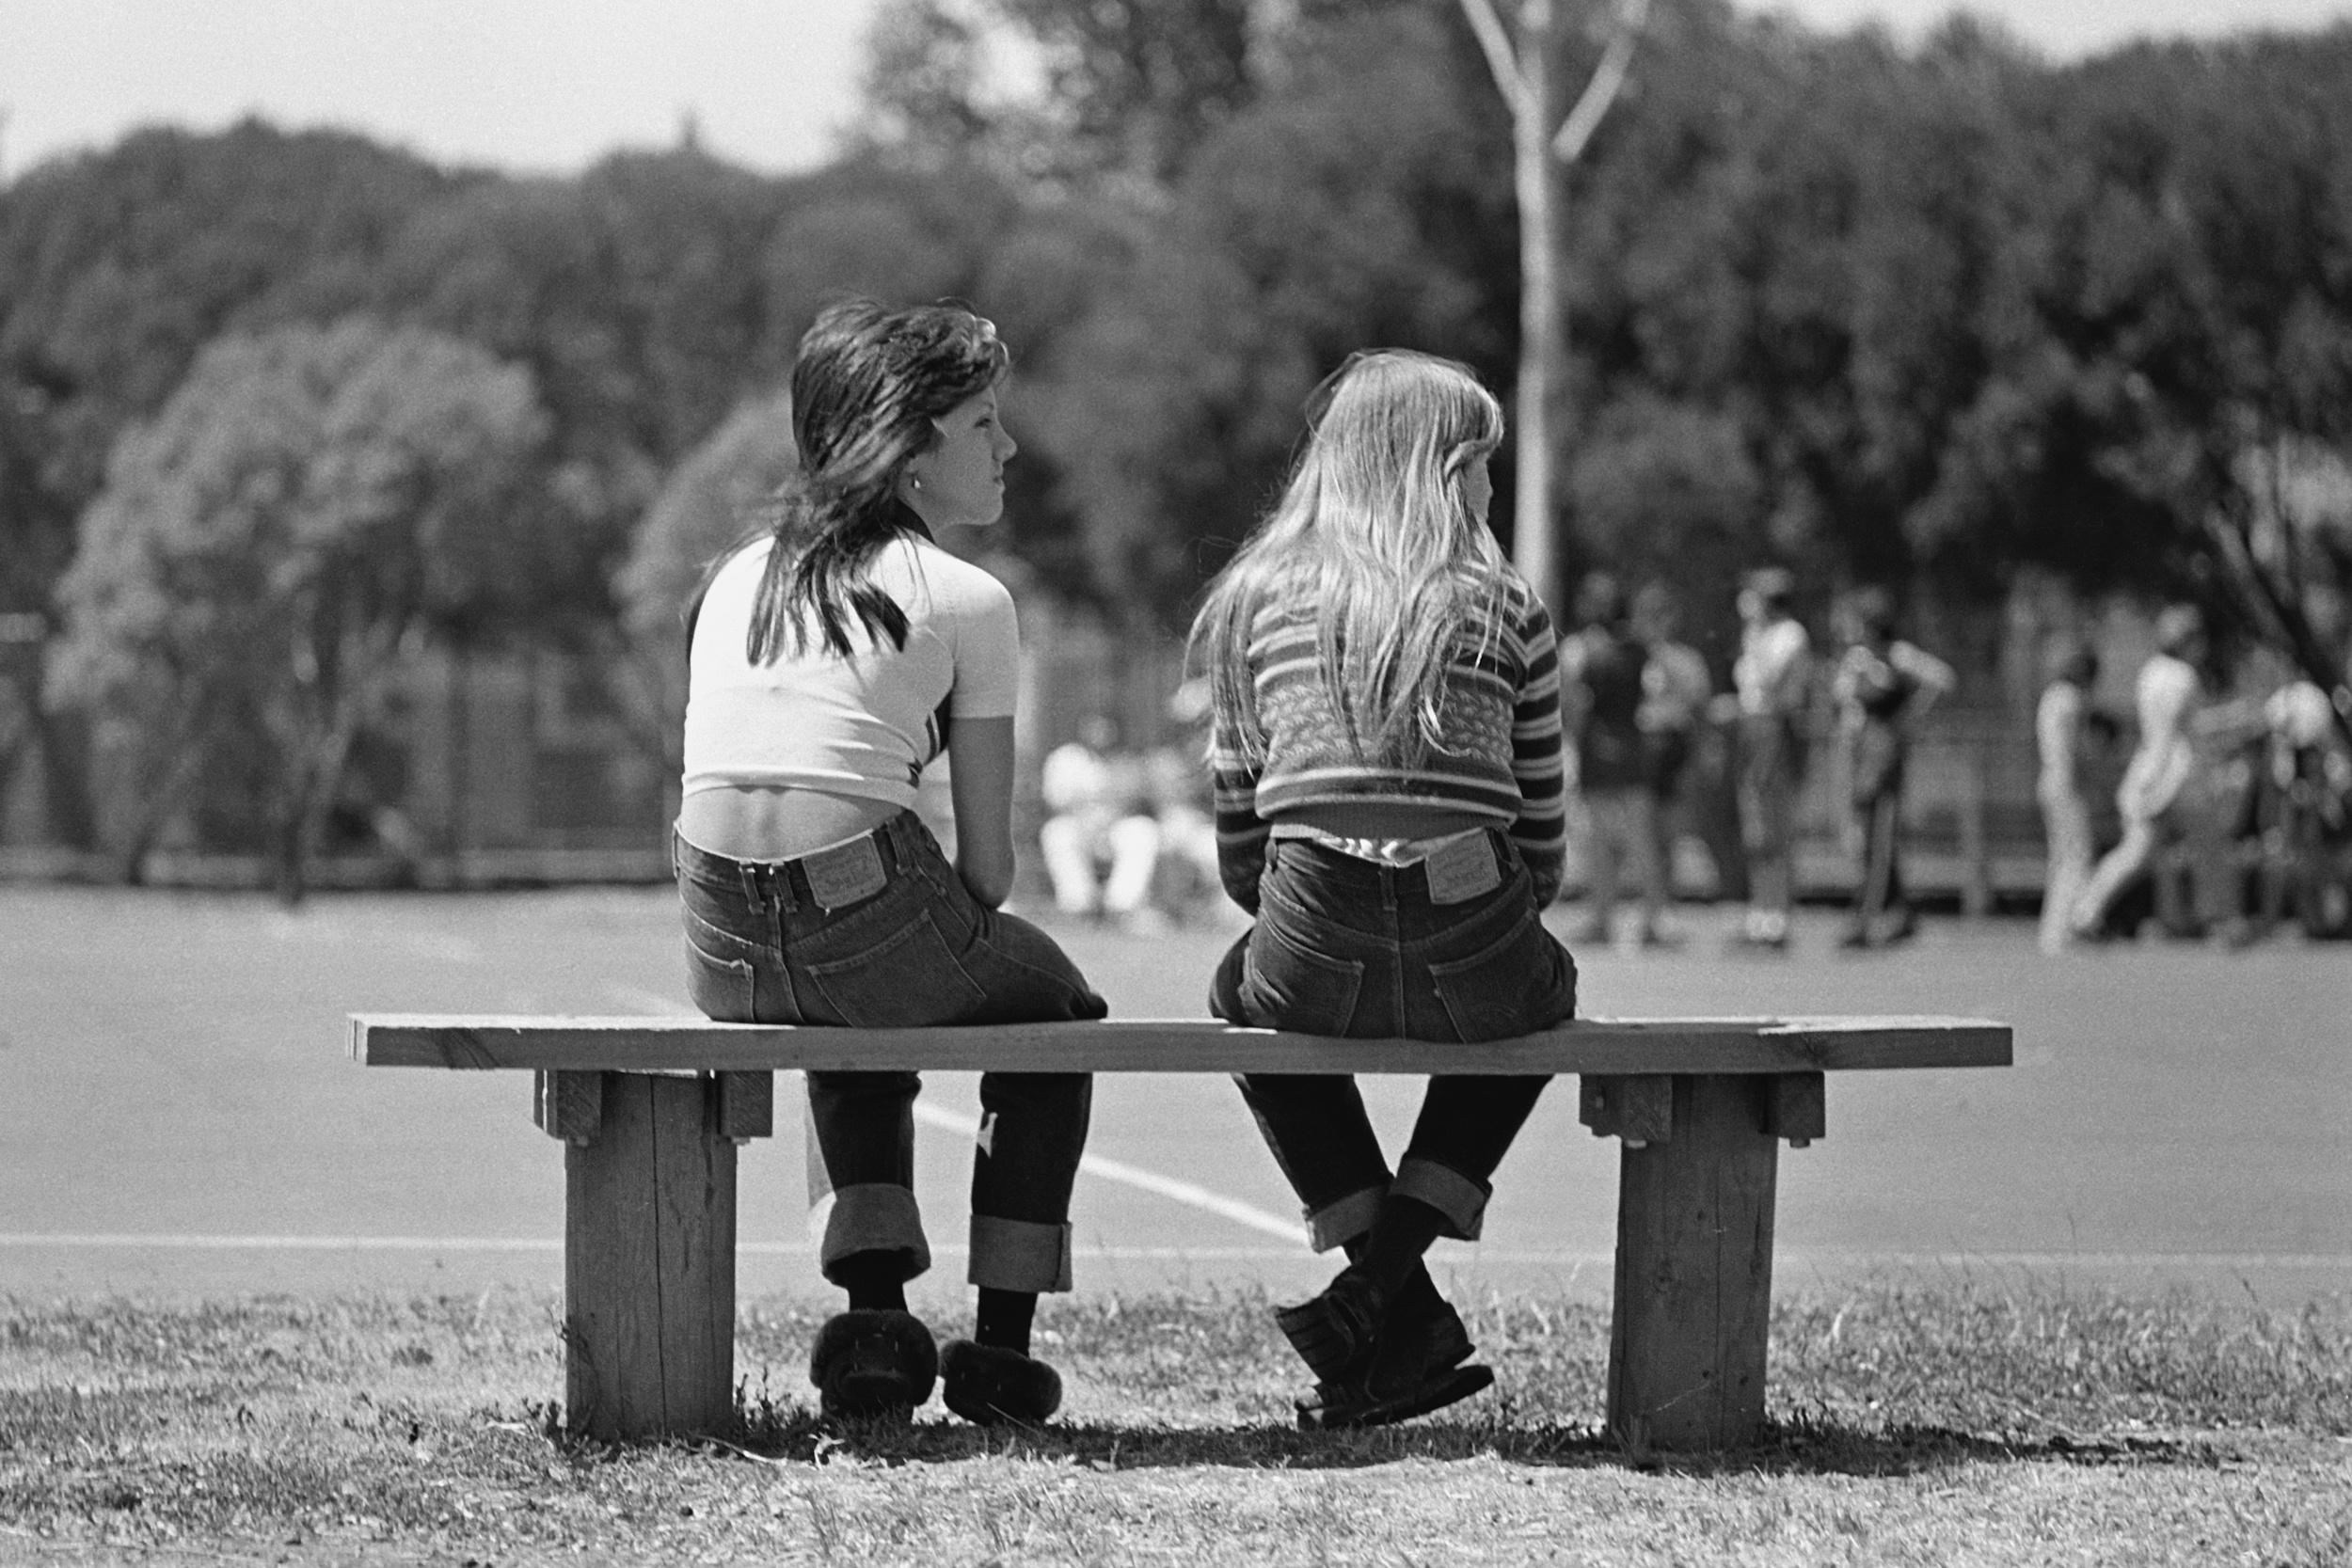 David Wadelton, Mayors Park, Clifton Hill, girls watching netball February, 1977